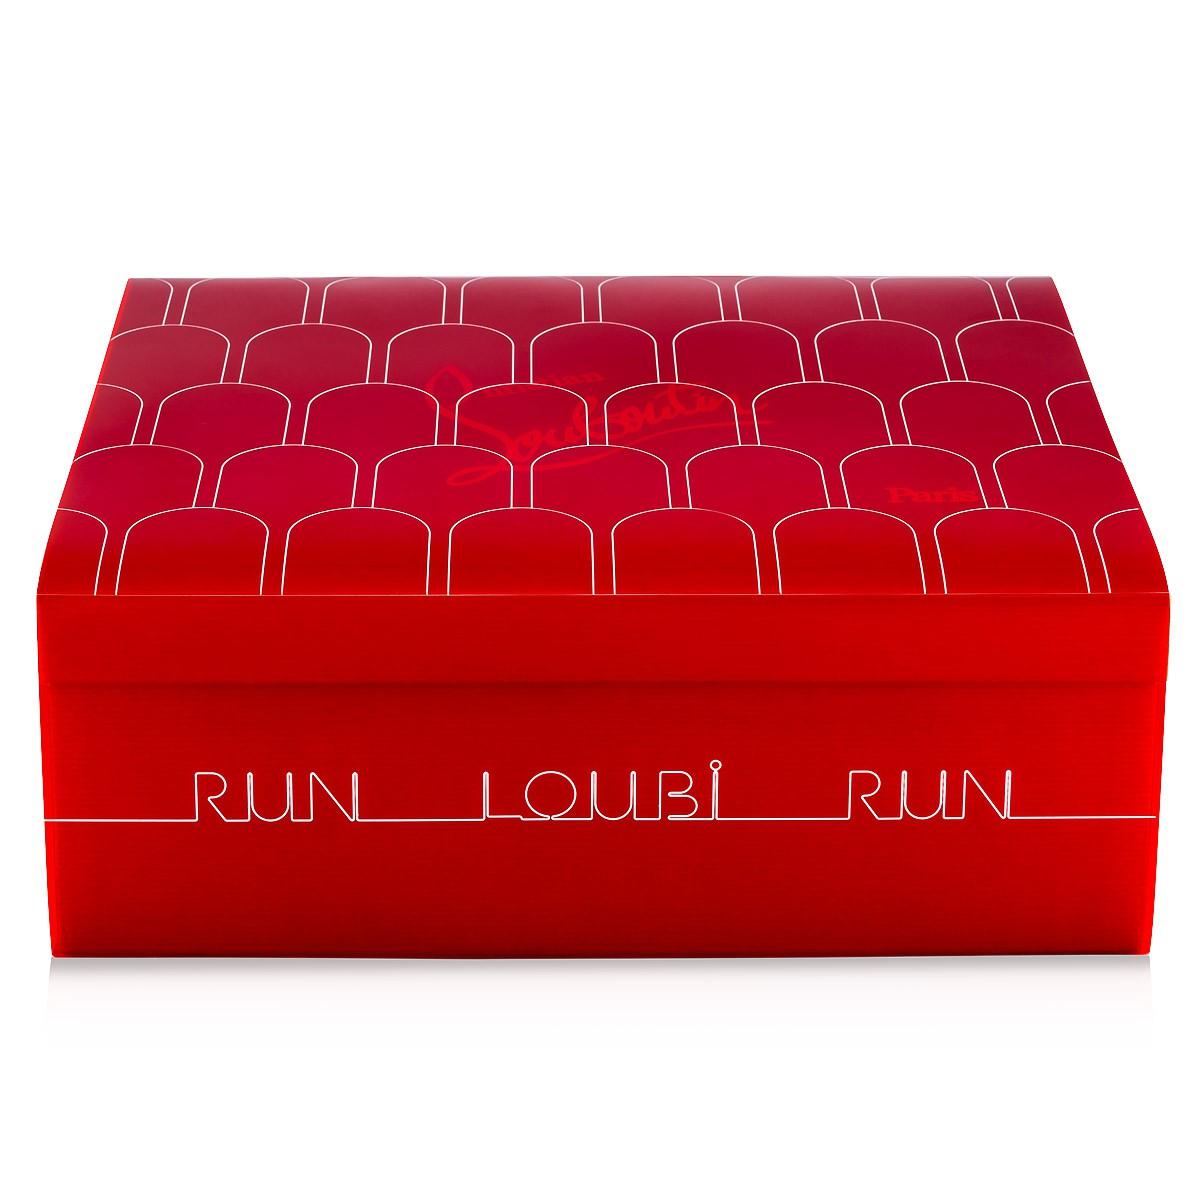 Shoes - Krystal Sock - Christian Louboutin